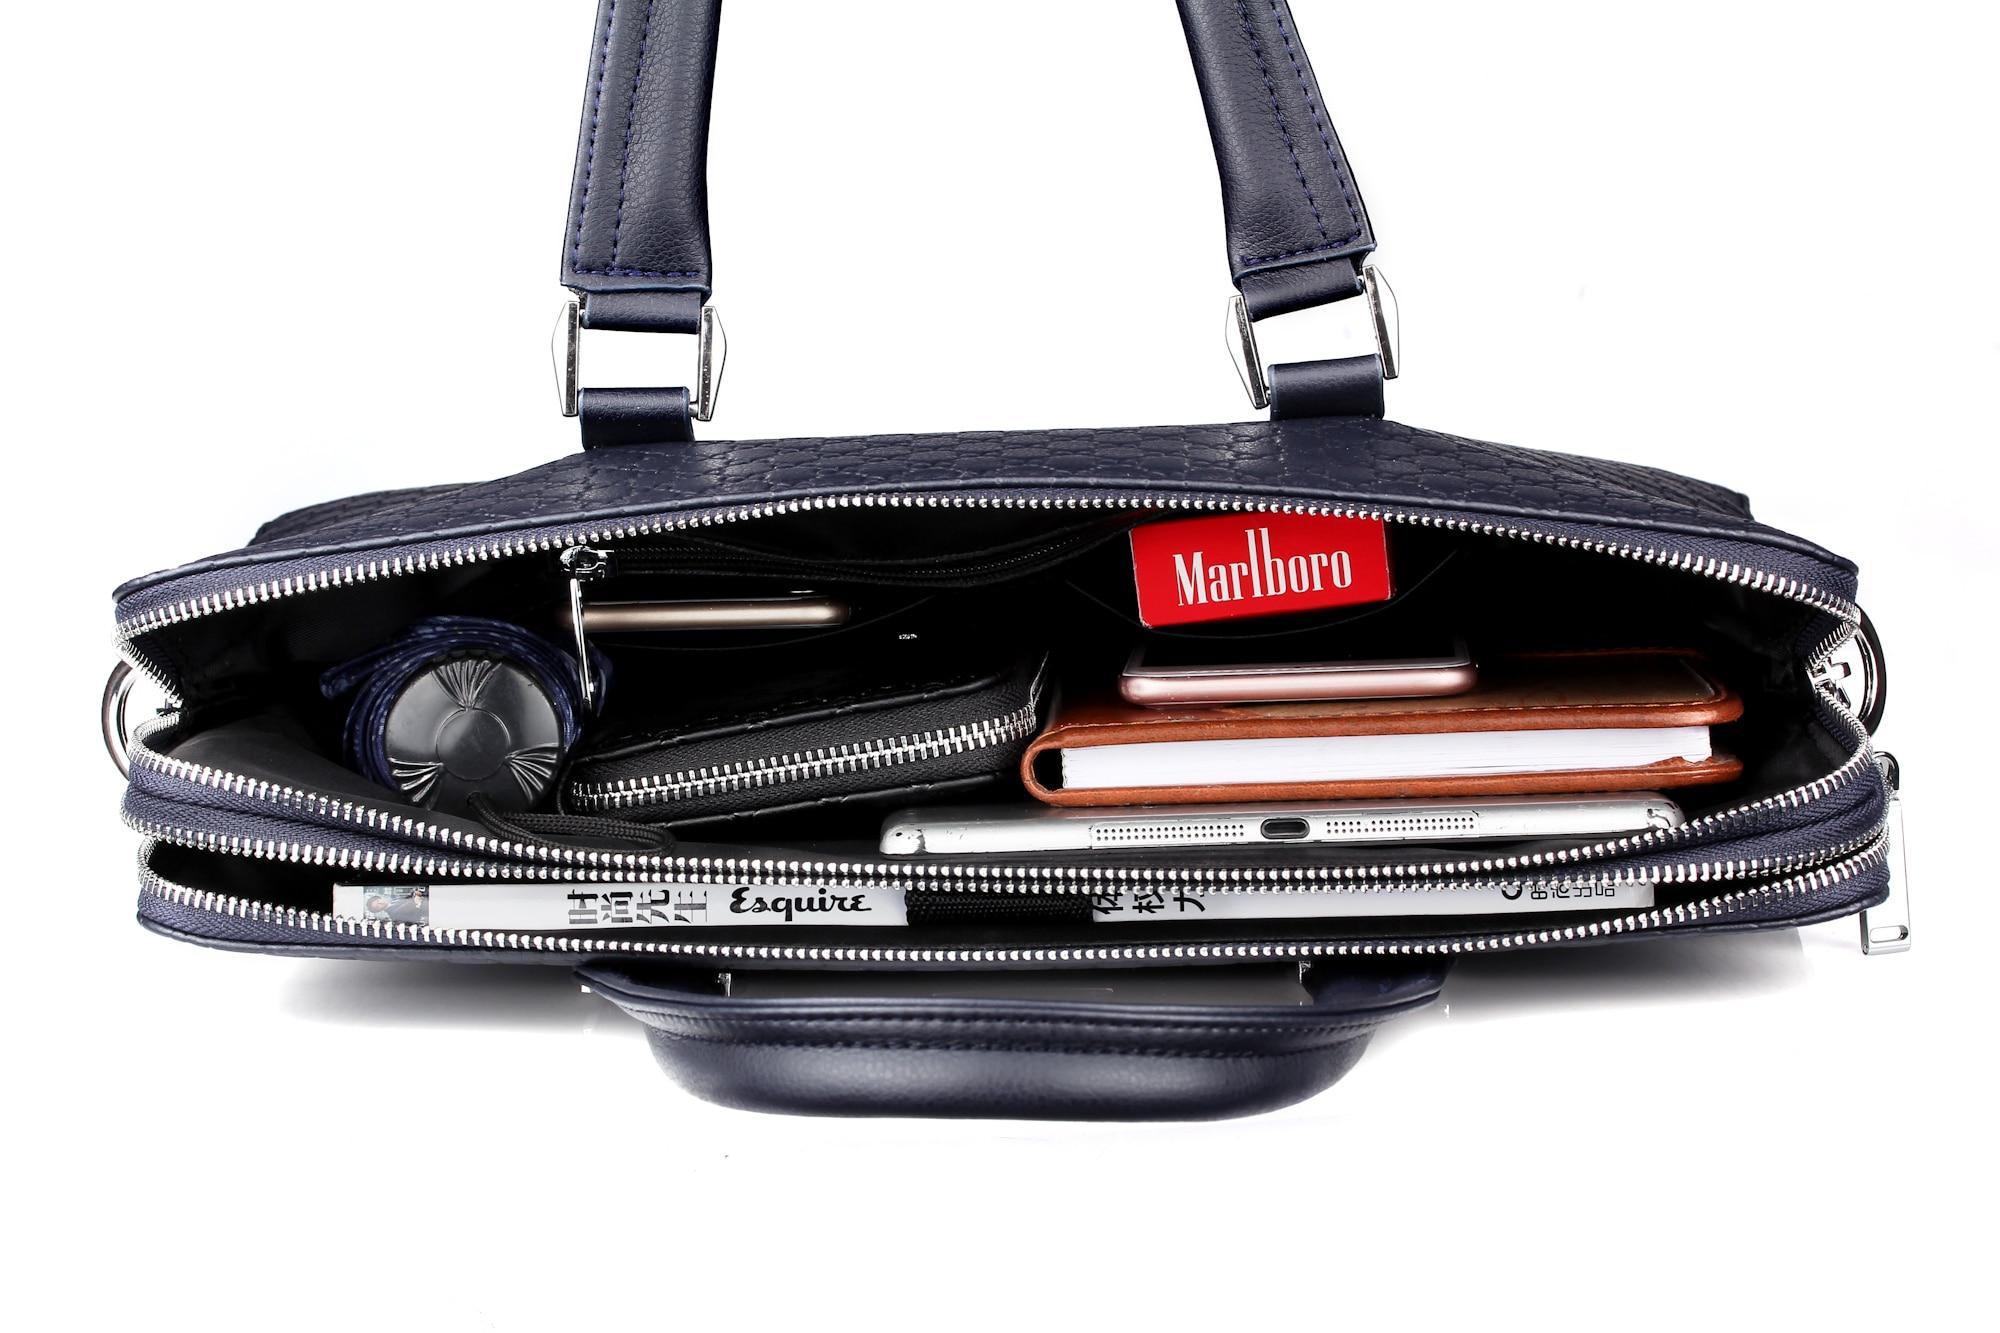 HTB1EDPpbqSs3KVjSZPiq6AsiVXaW Double Layers Men's Microfiber Synthetic Leather Business Briefcase Casual Shoulder Bag Messenger Bag Laptop Handbag Travel Bag